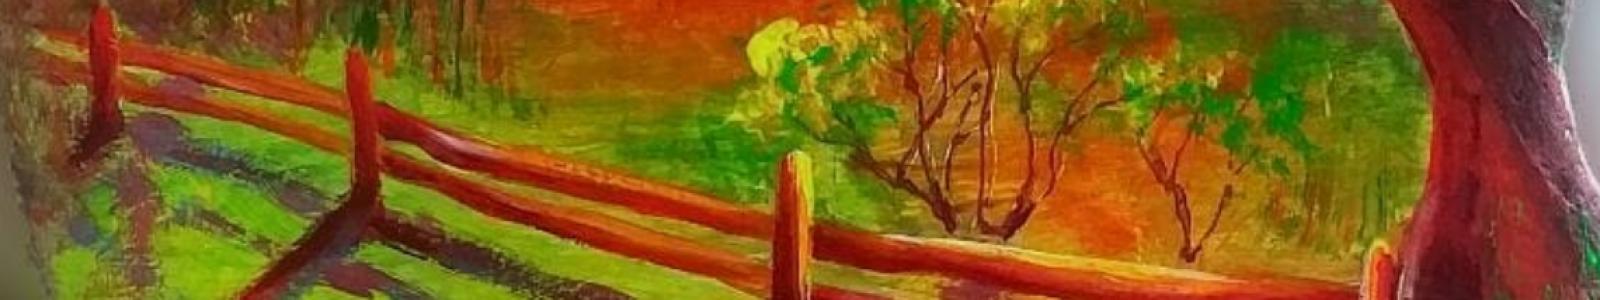 Gallery Painter irina popova